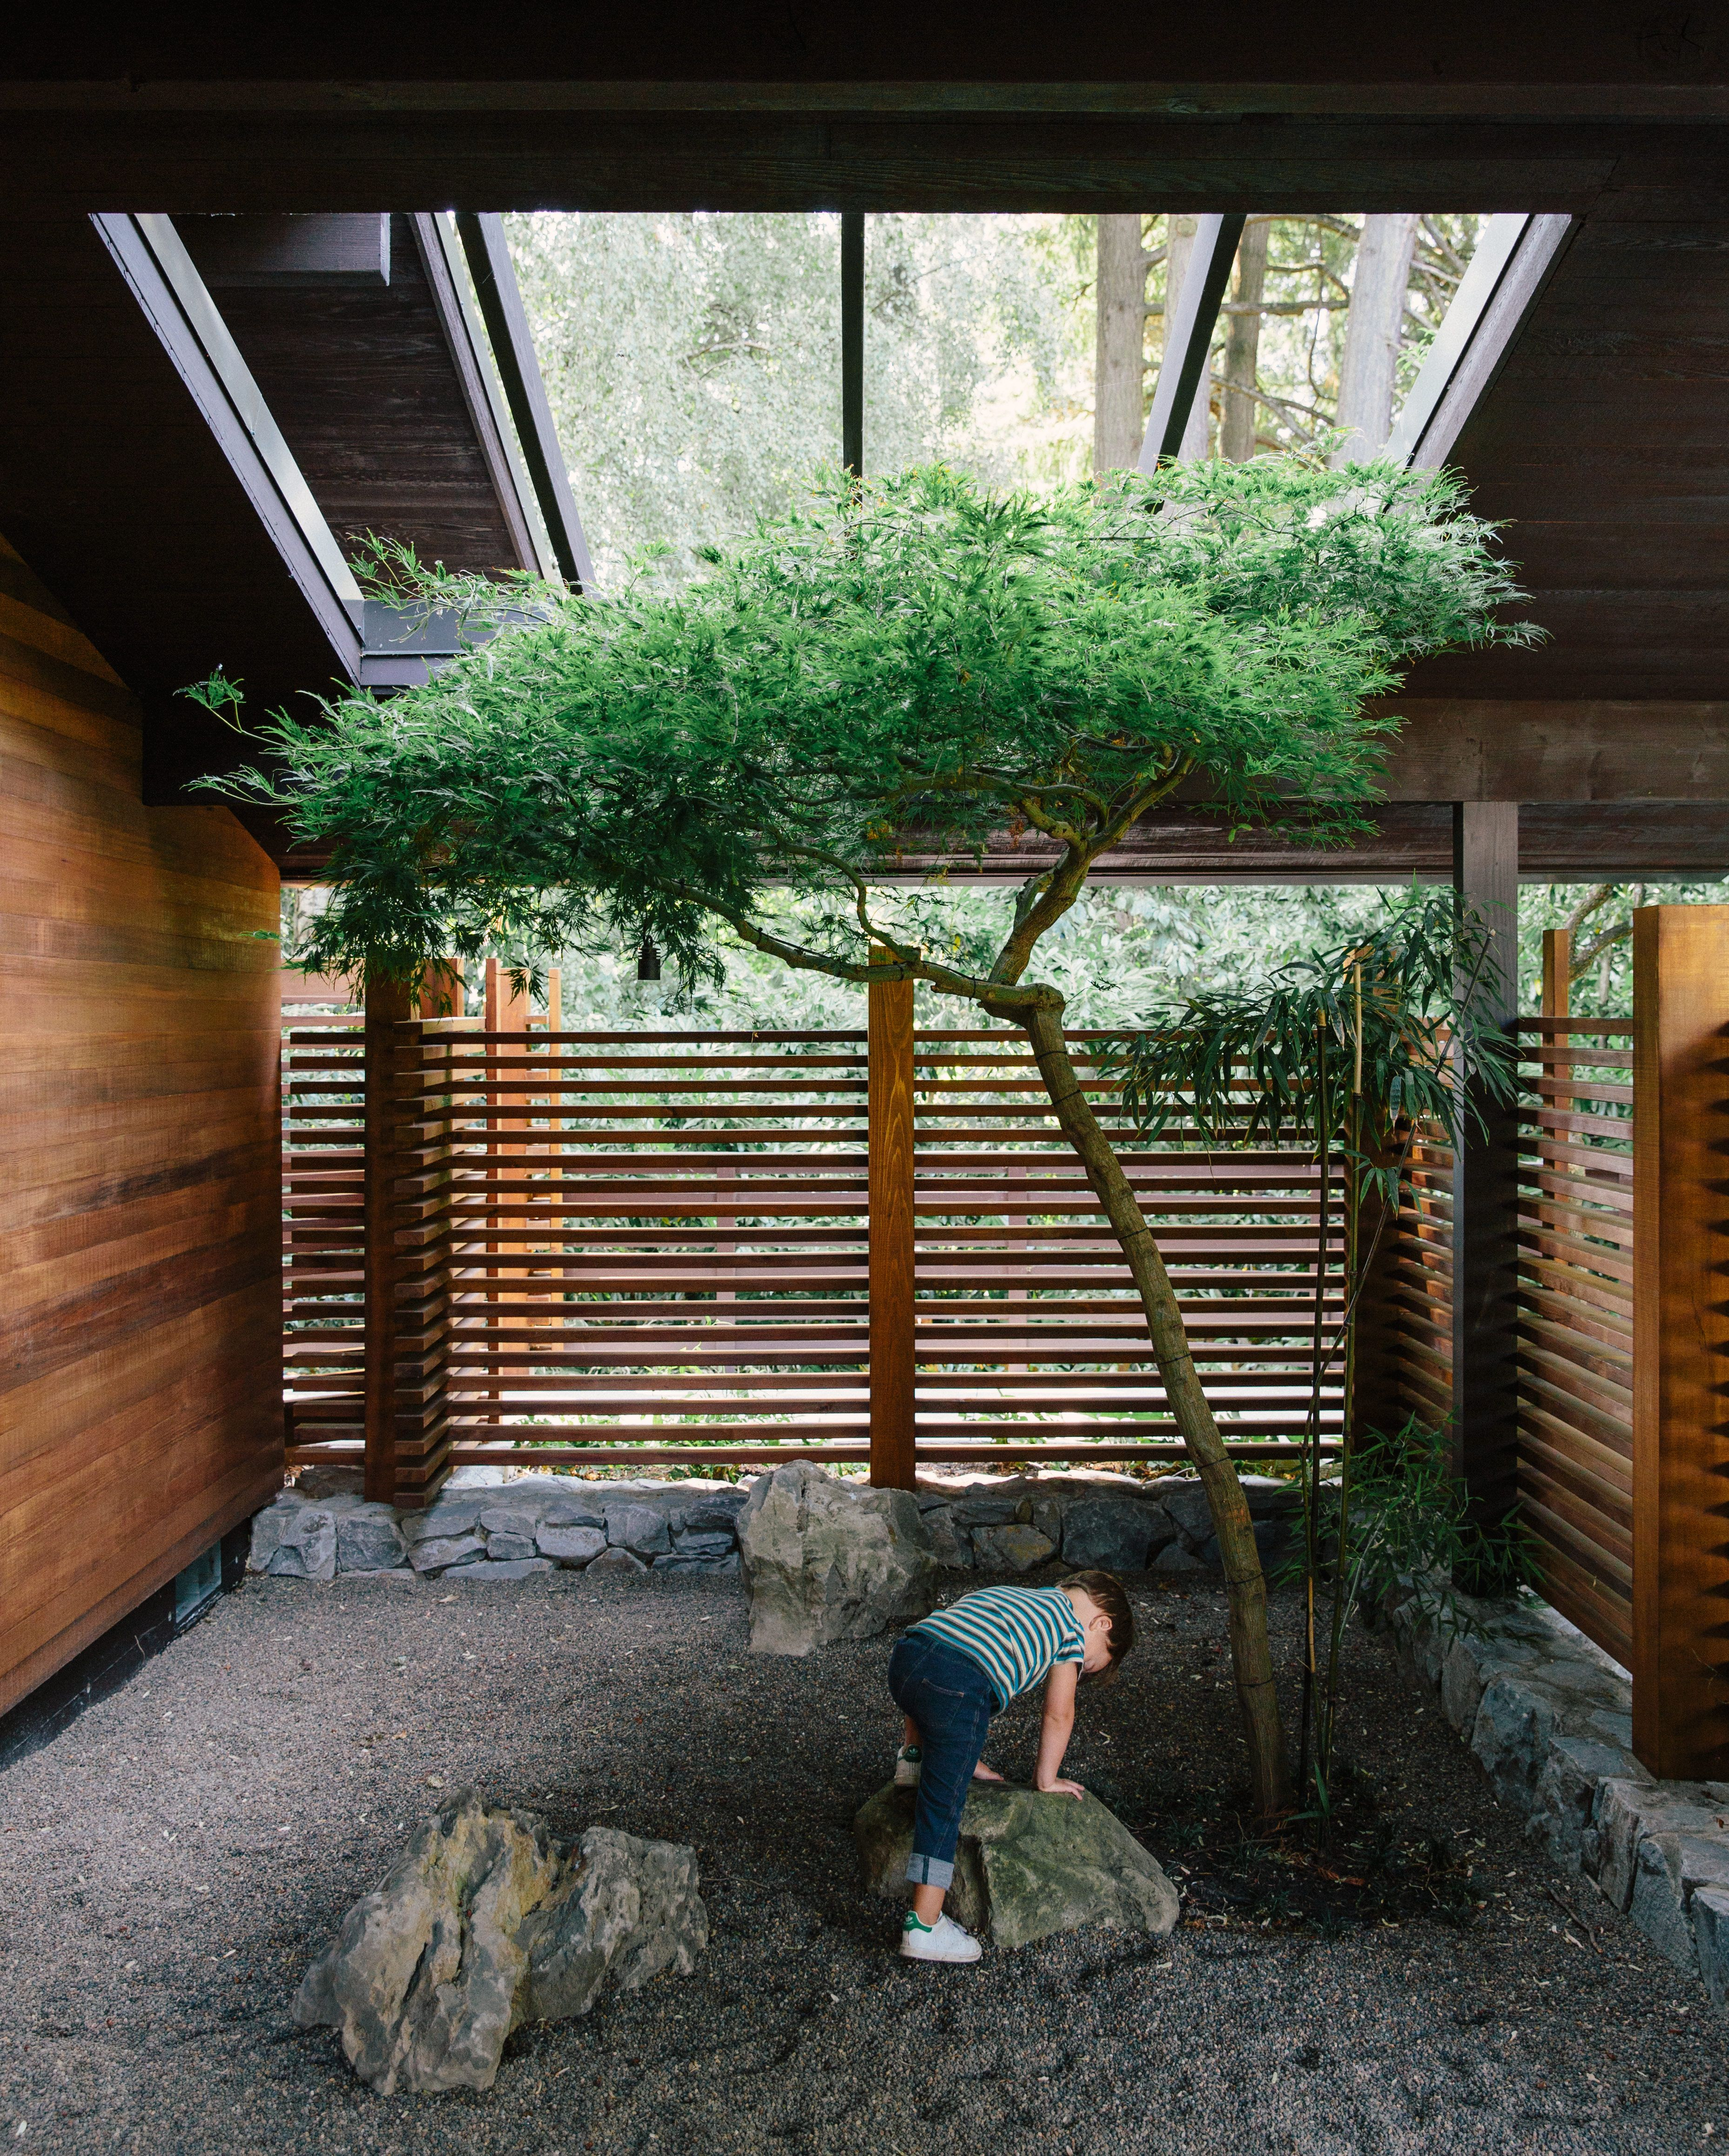 U0027Feast In The House Of Simonu0027 Series. Japanese Rock GardenJapanese ...